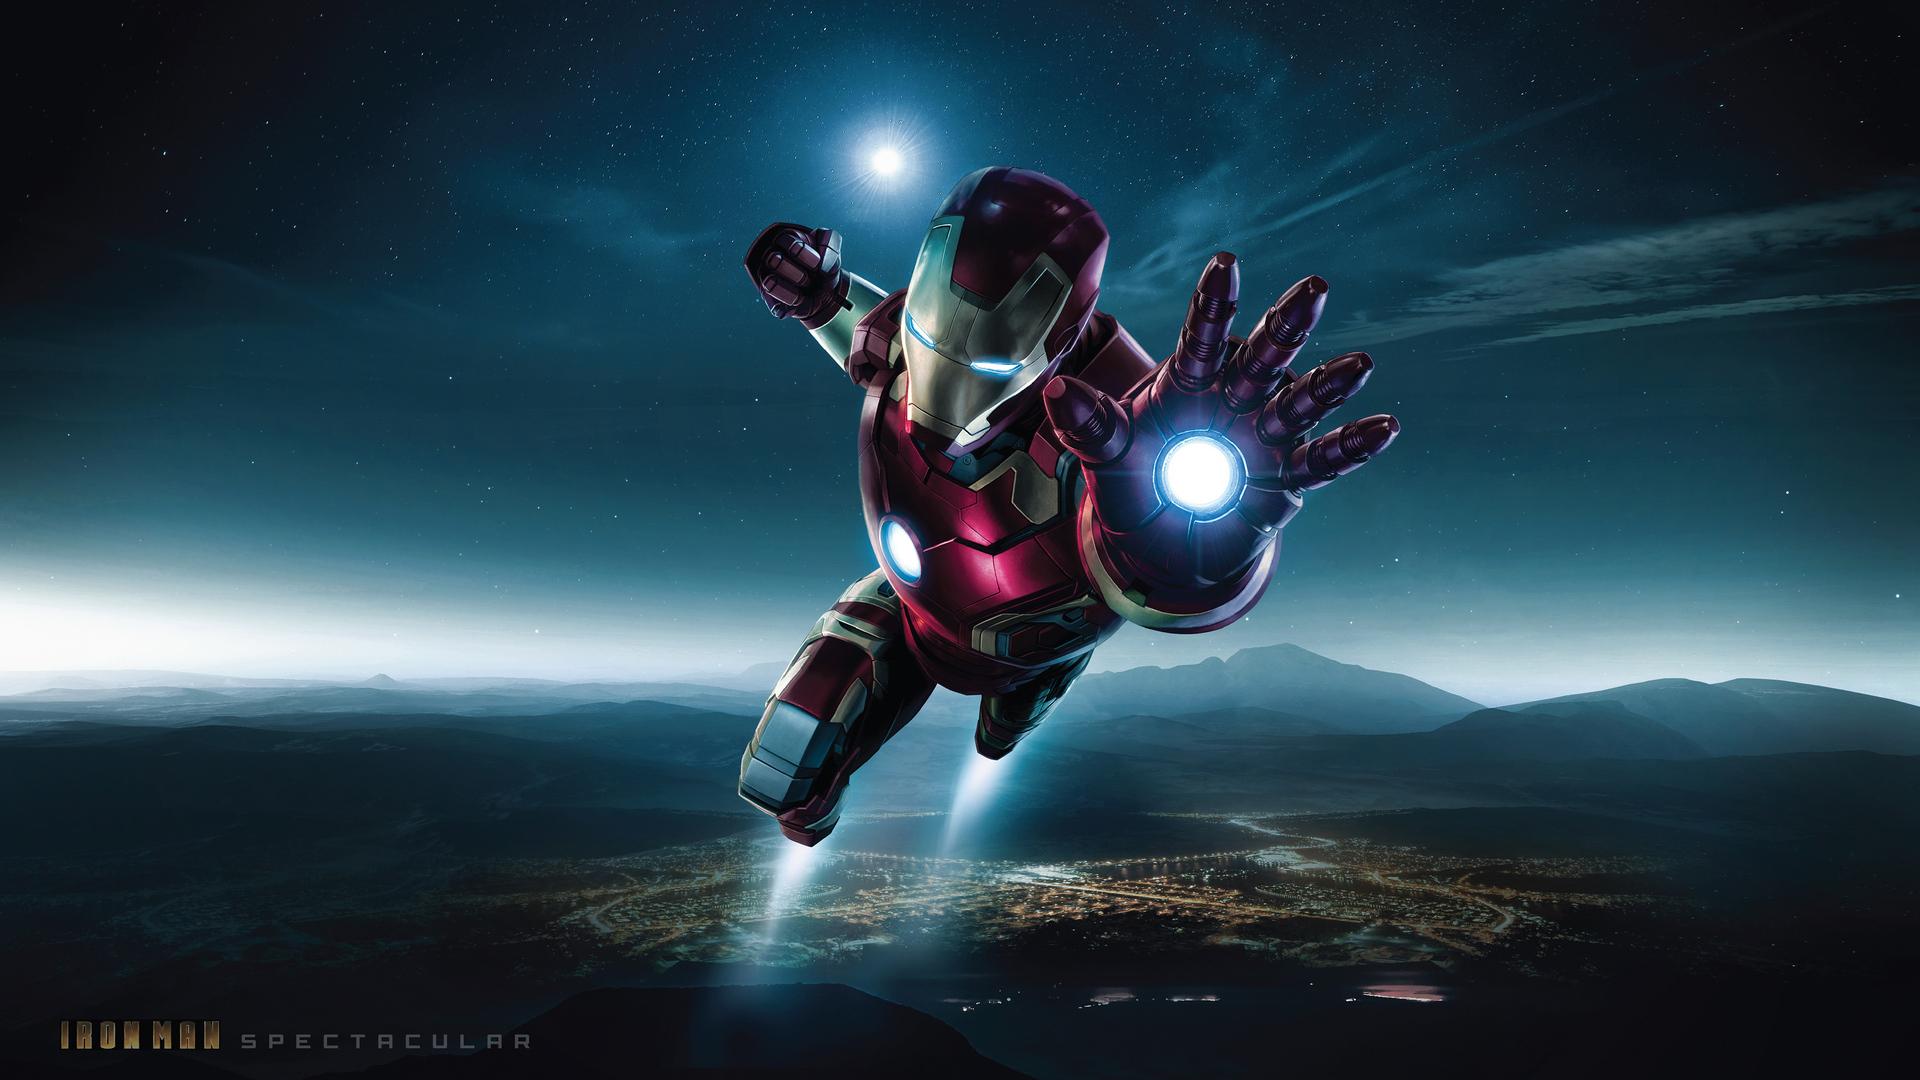 1920x1080 Spectacular Iron Man 4k Laptop Full Hd 1080p Hd 4k